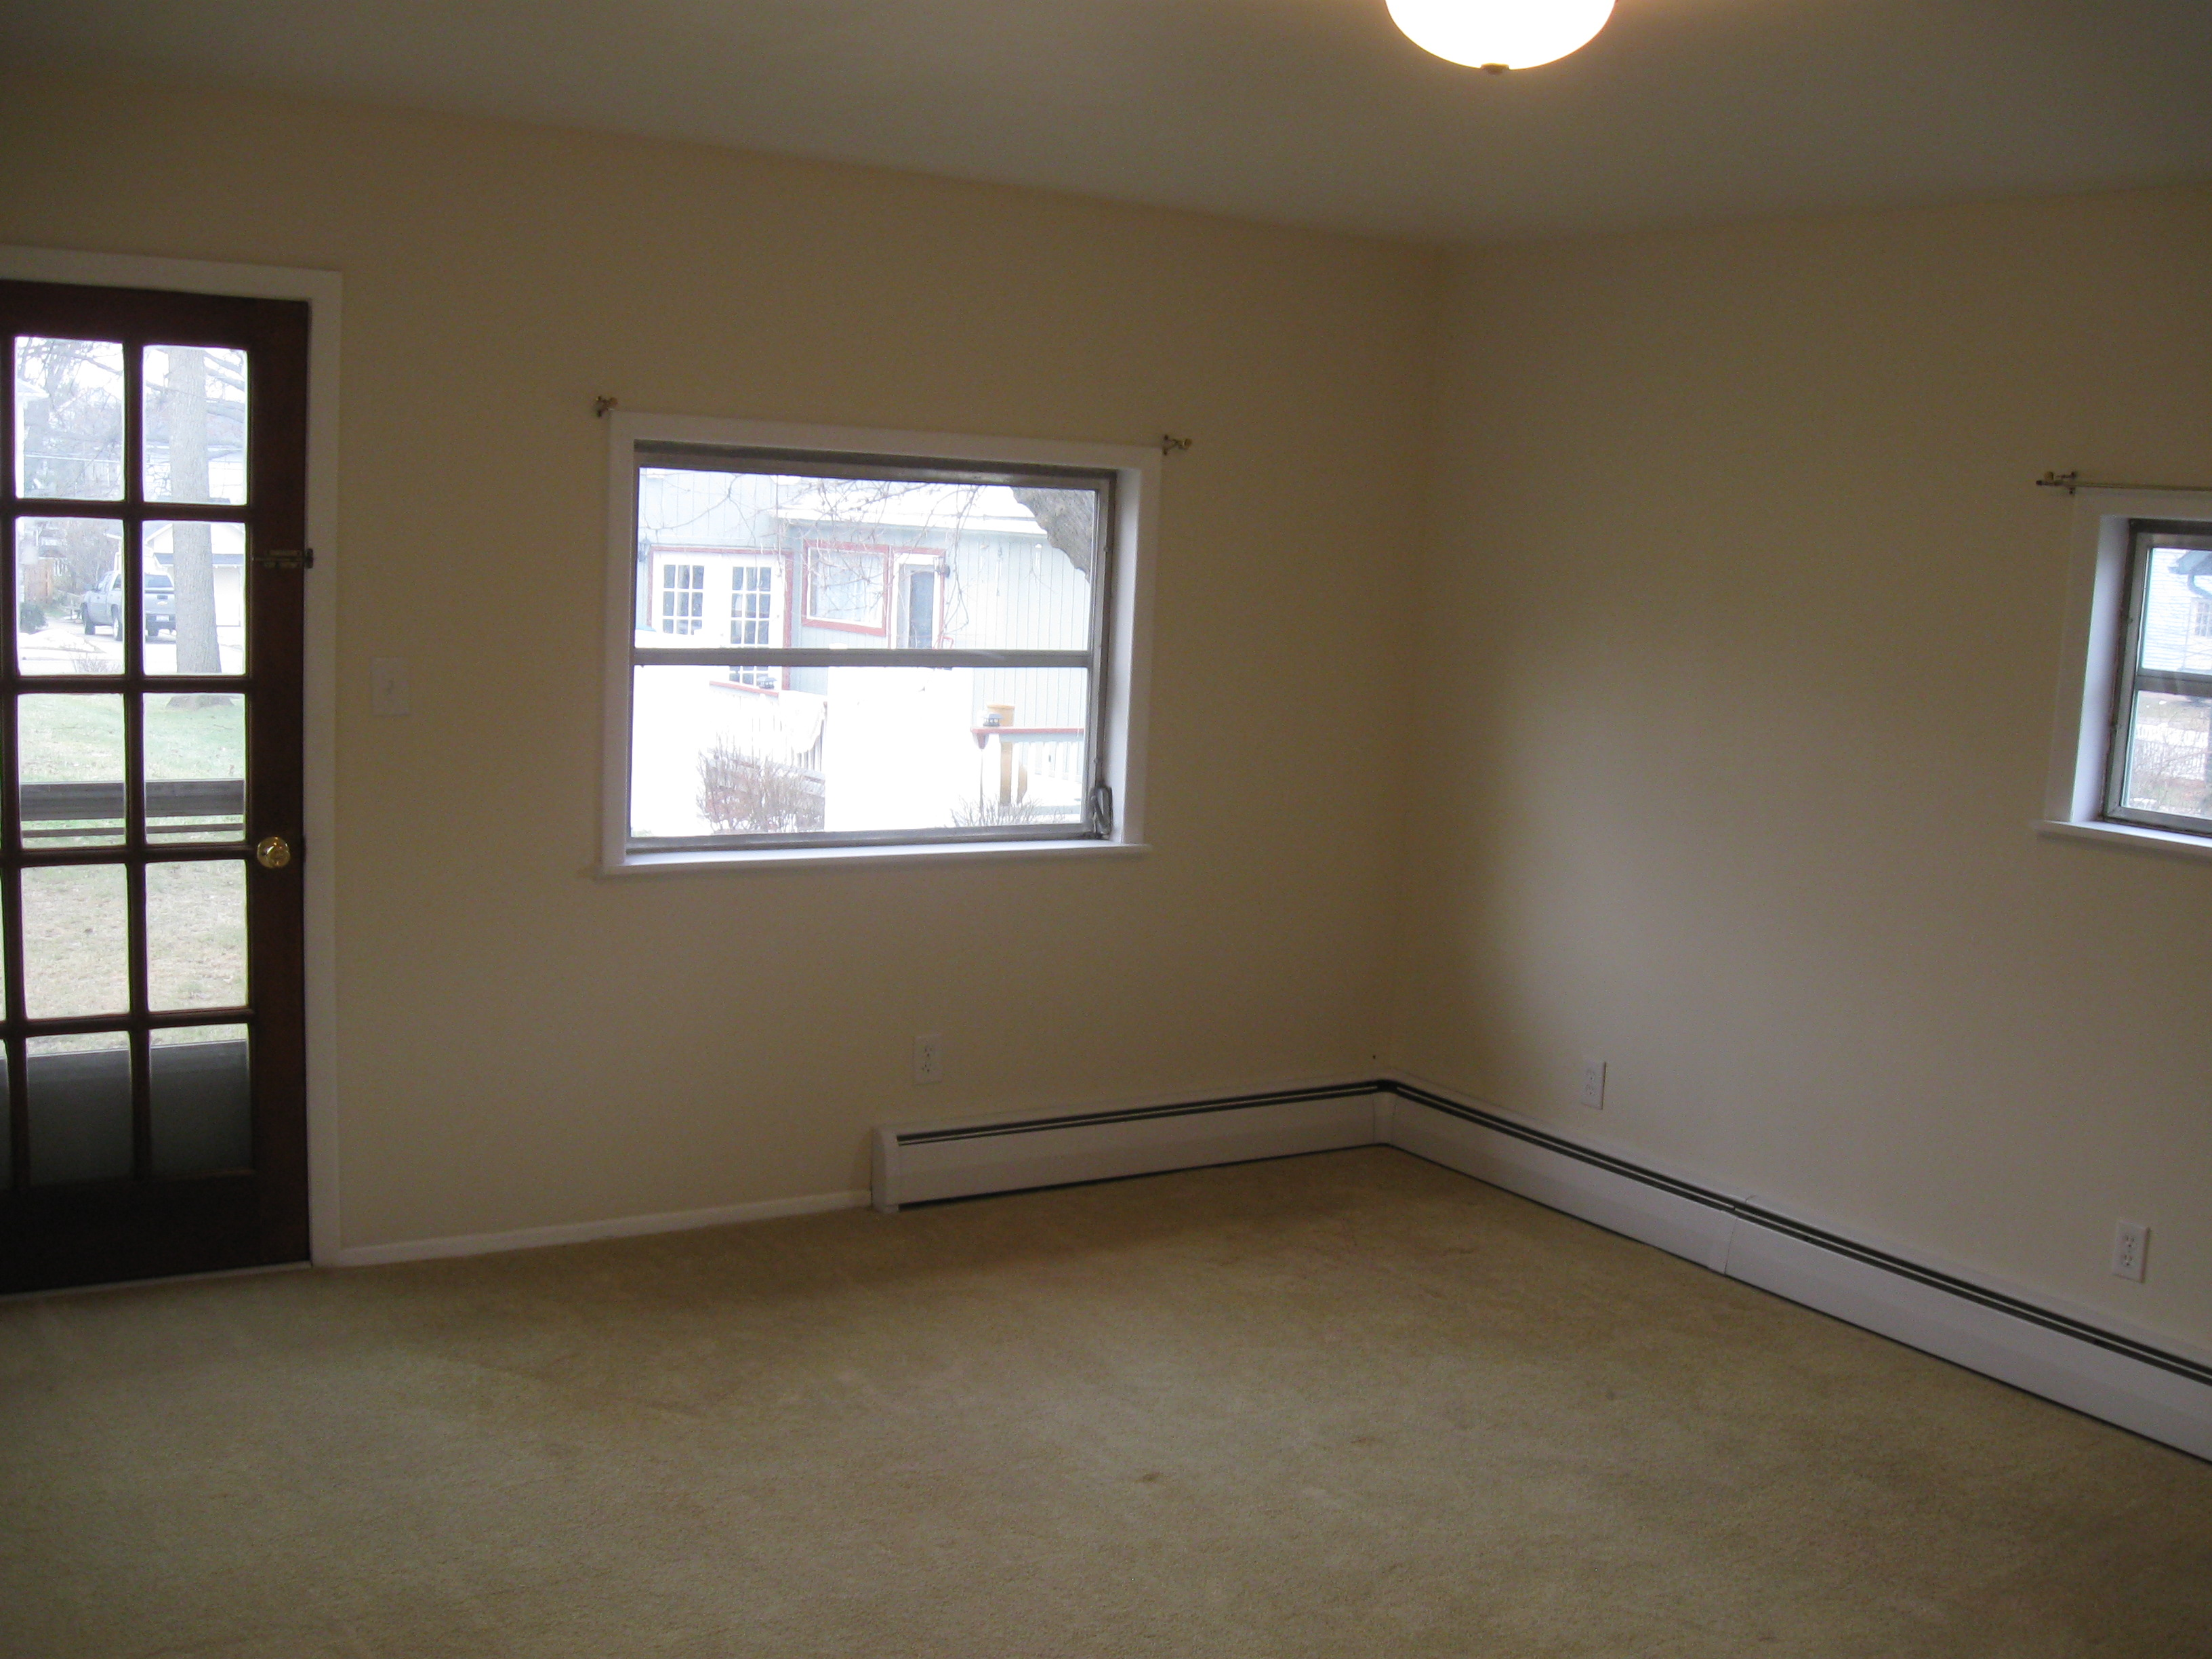 68 N Vine St Apt 1a Westerville Oh 3 Bedroom Apartment